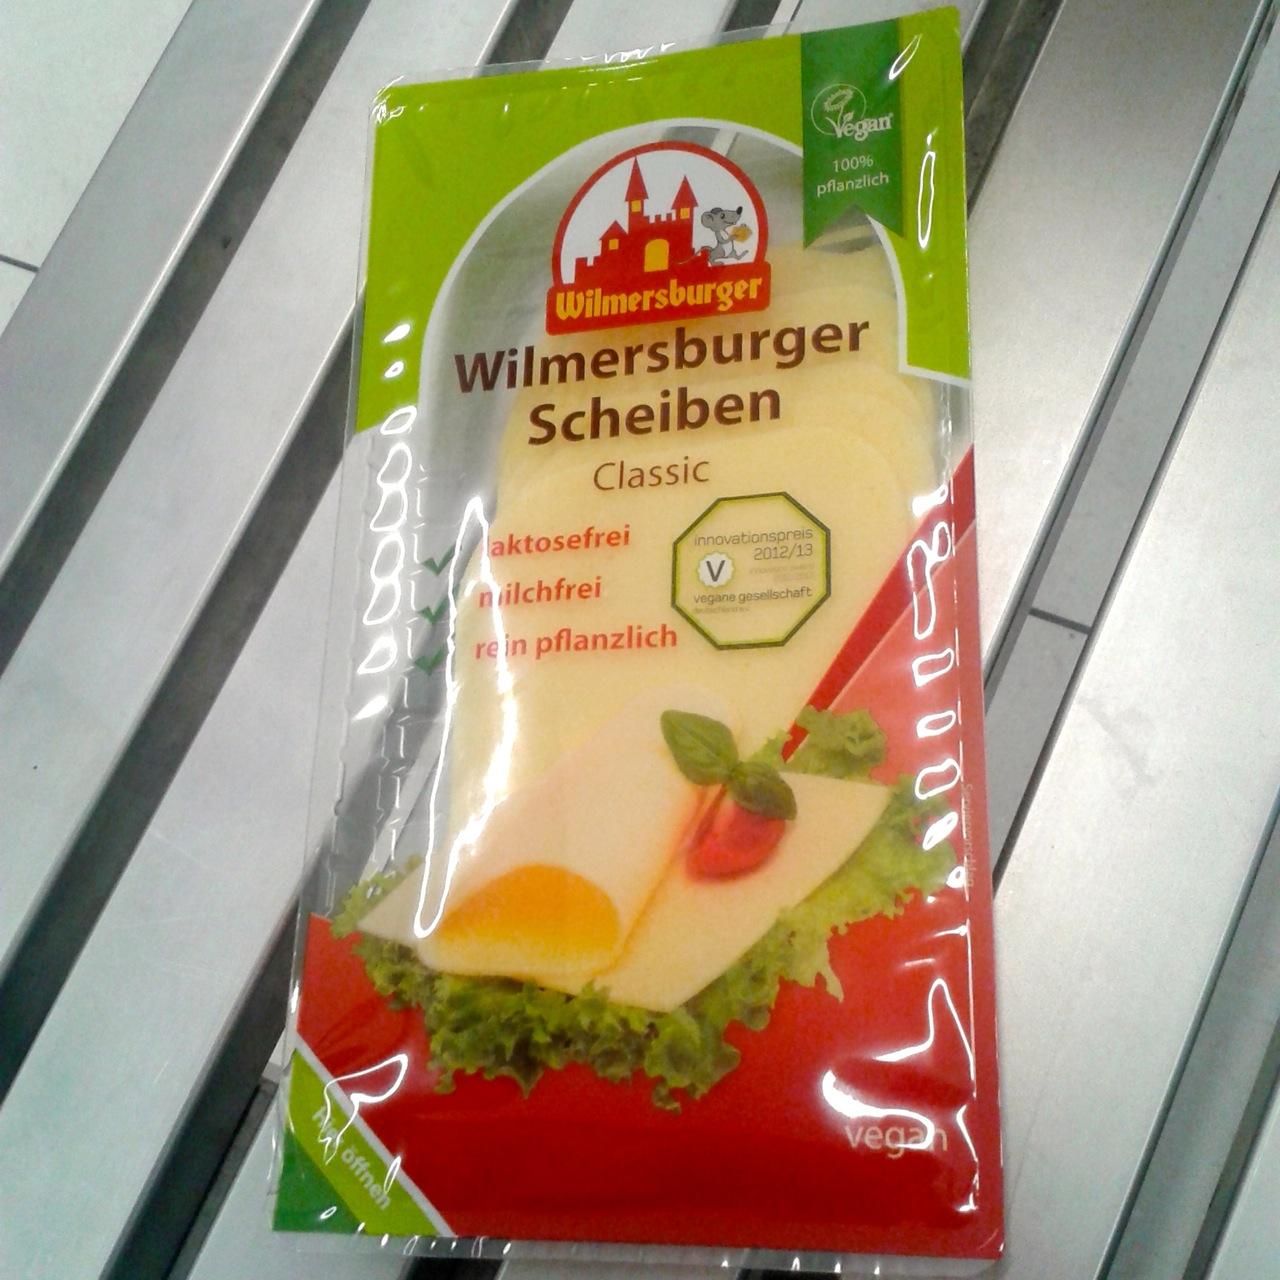 http://i2.wp.com/fatgayvegan.com/wp-content/uploads/2015/01/wilmersburger-slices.jpg?fit=1280%2C1280